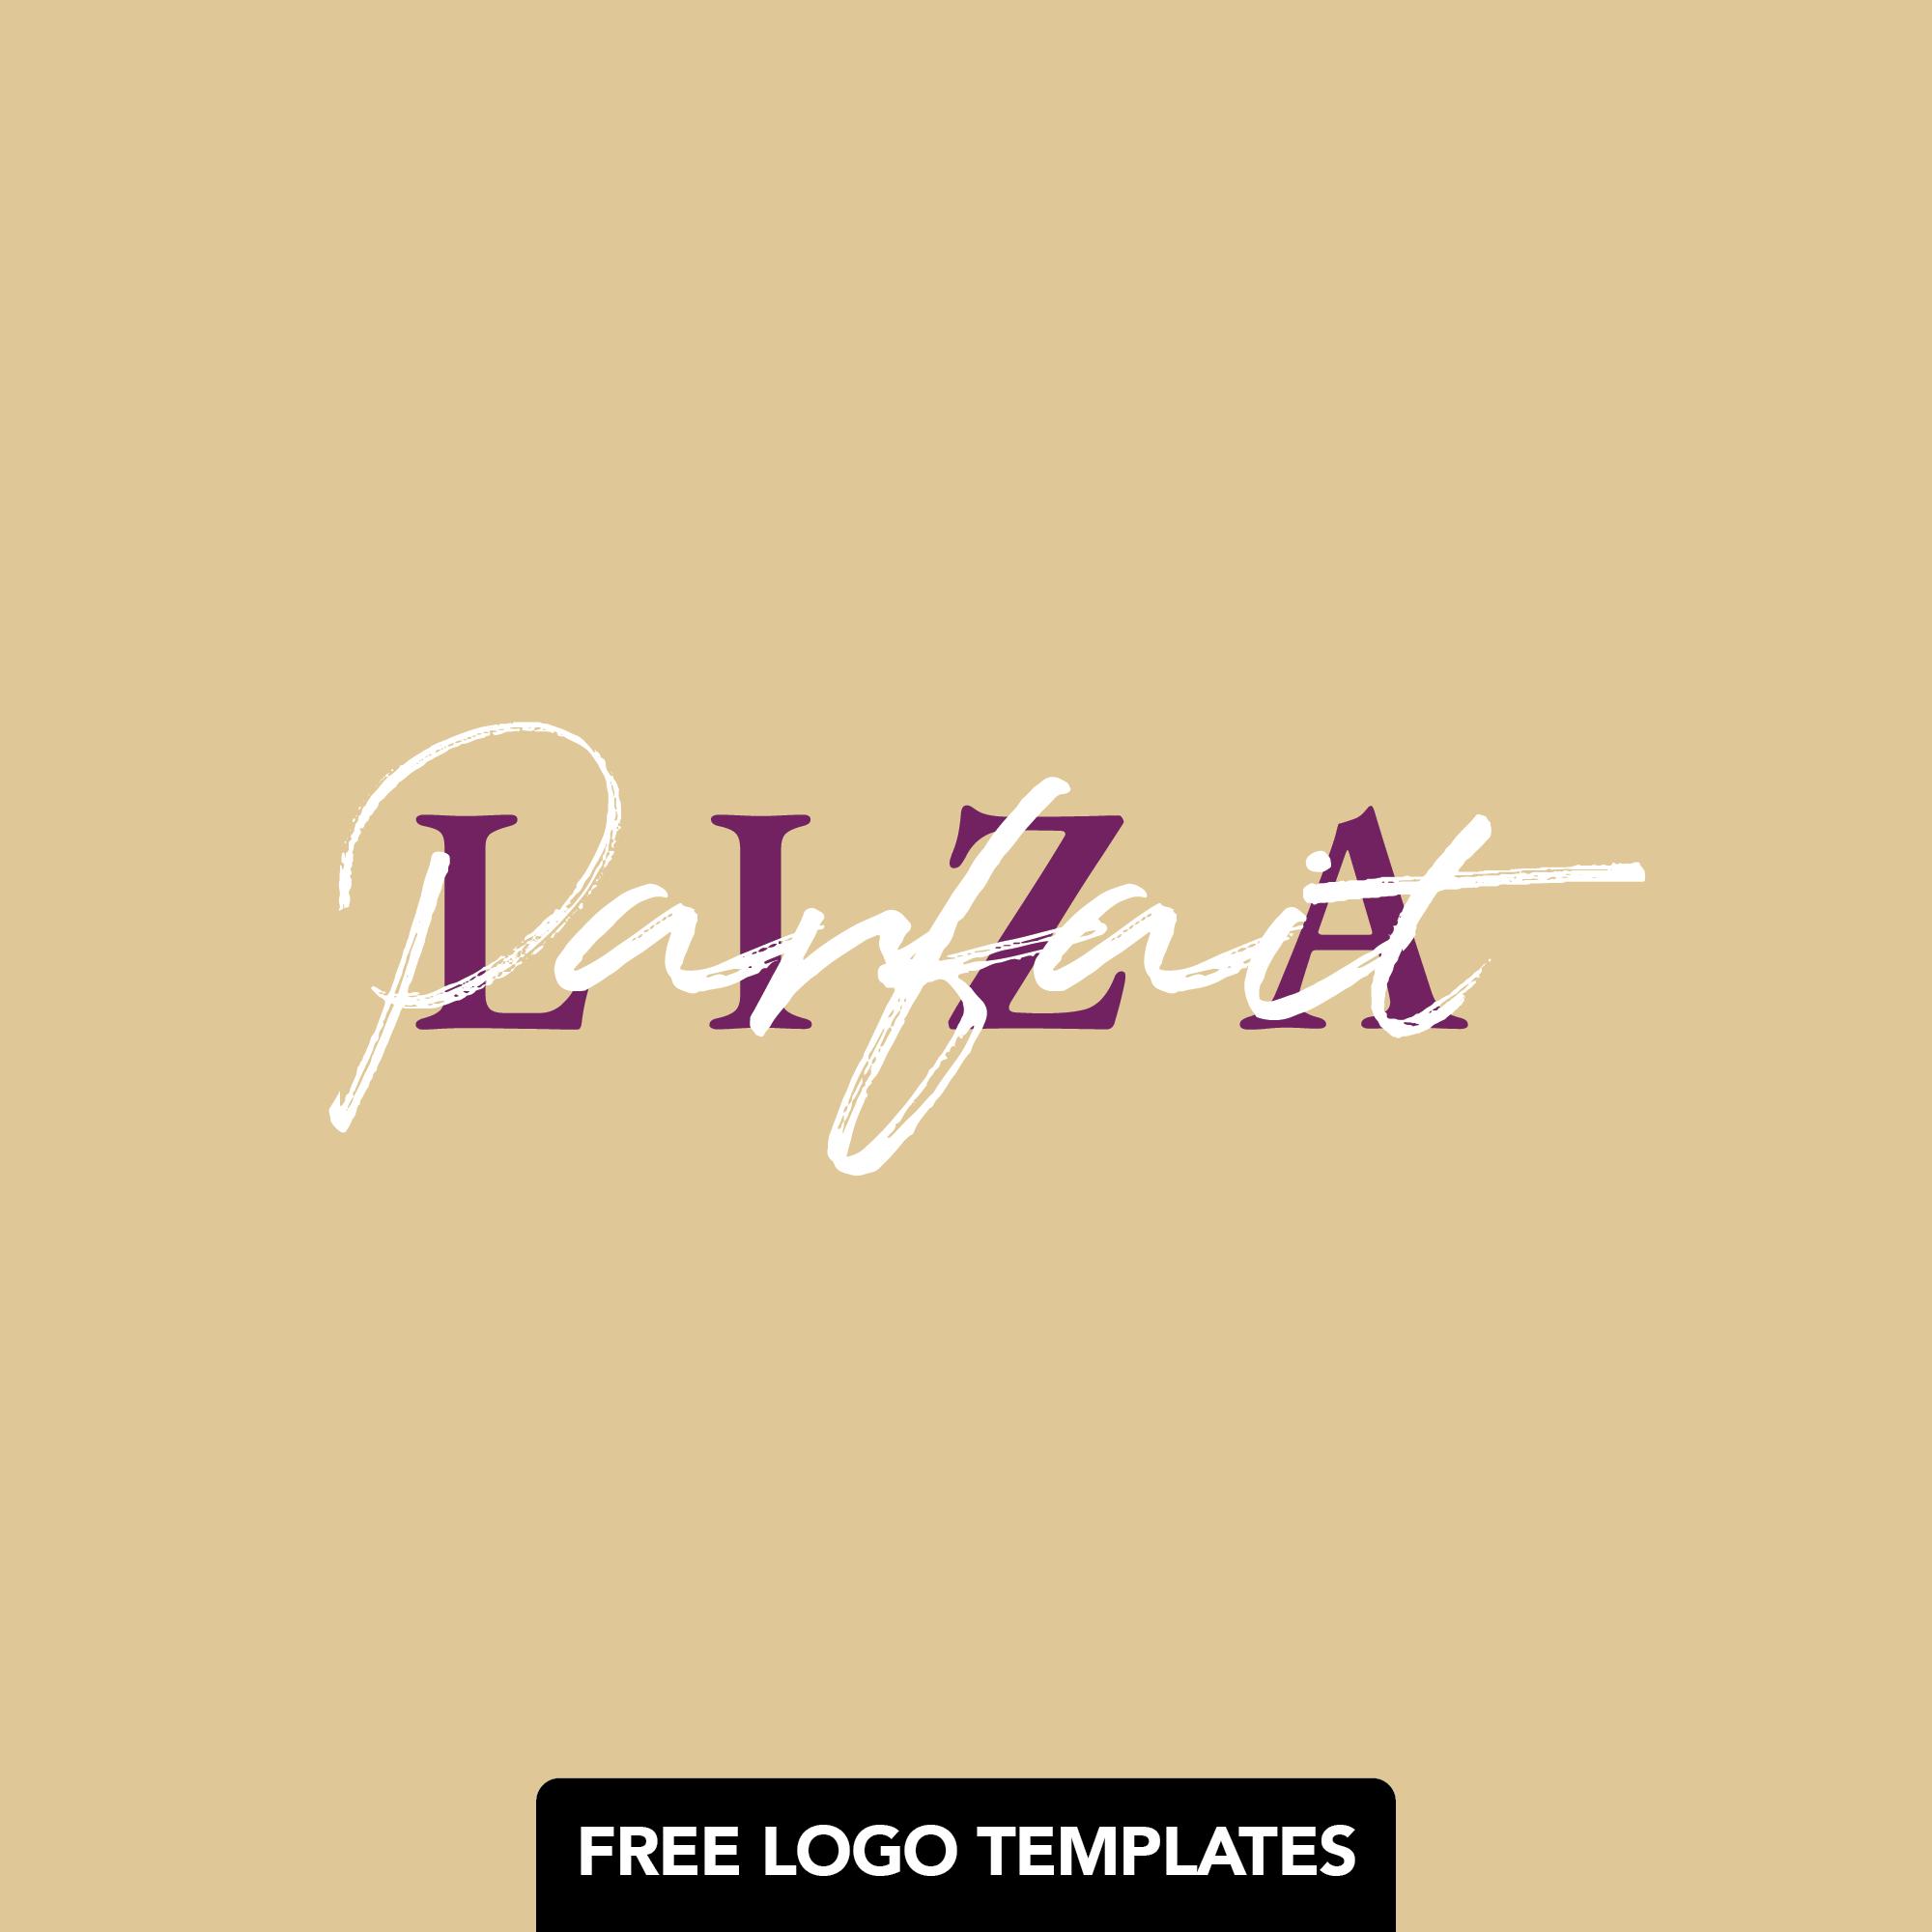 Liza Parfait – Free Editable Premade Logo Template – PSD/AI Files Provided